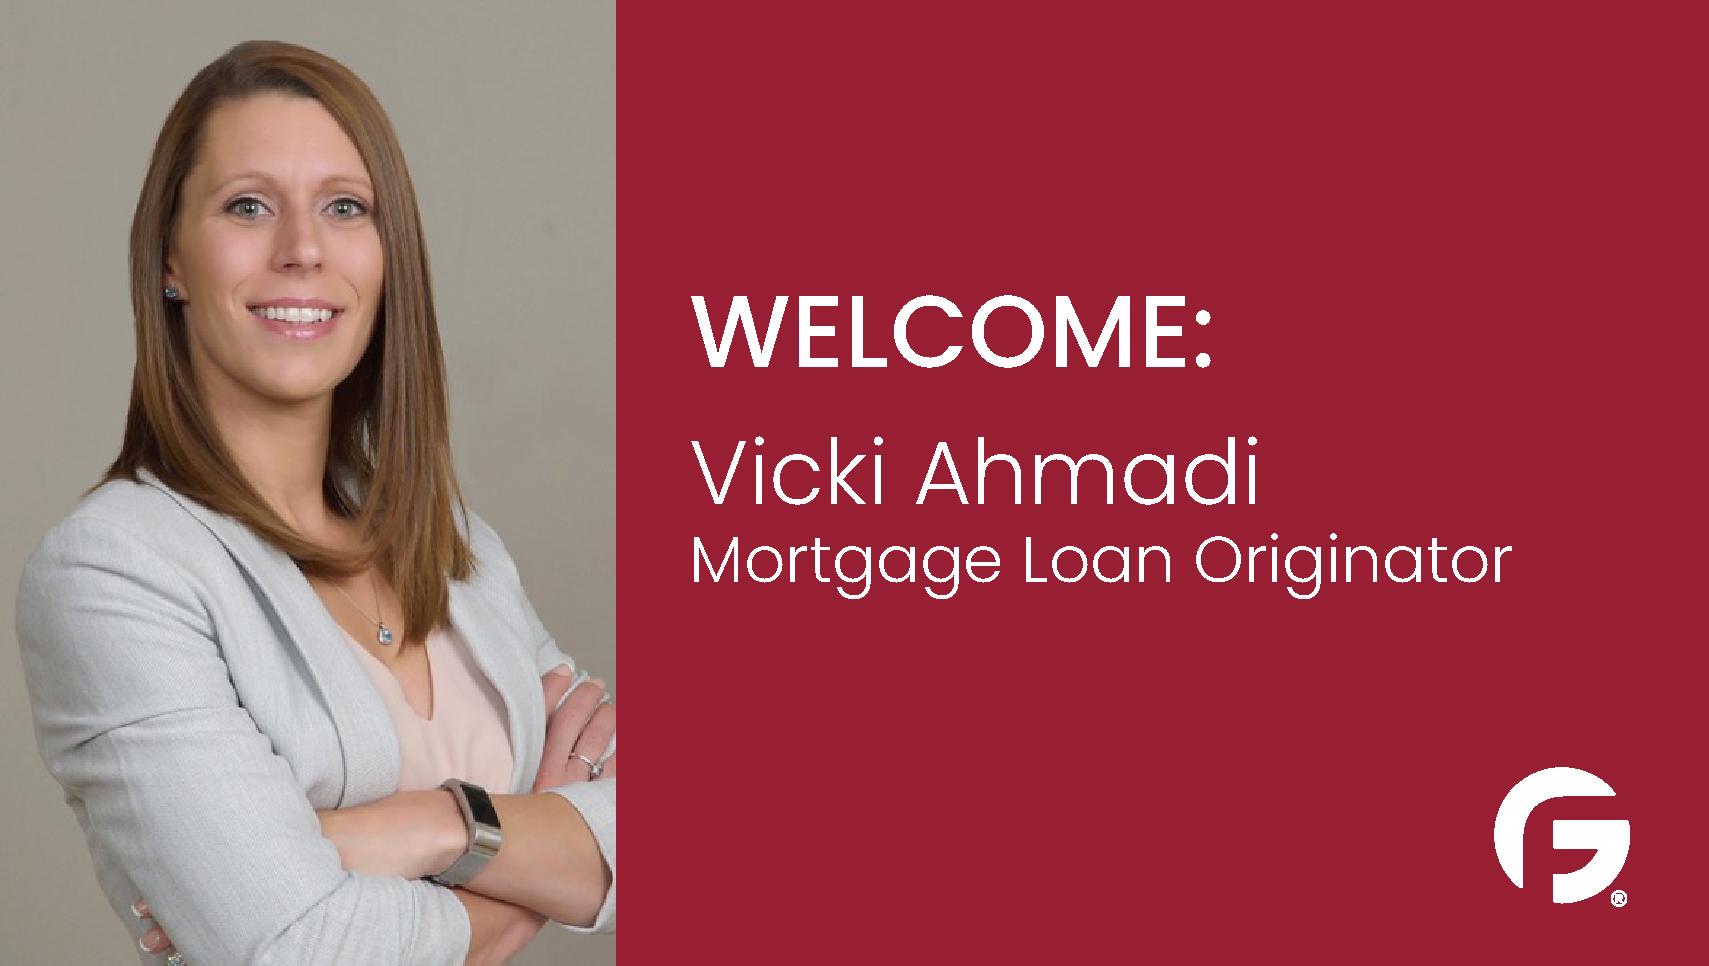 Vicki Ahmadi, Loan Officer, serving the state of Oregon